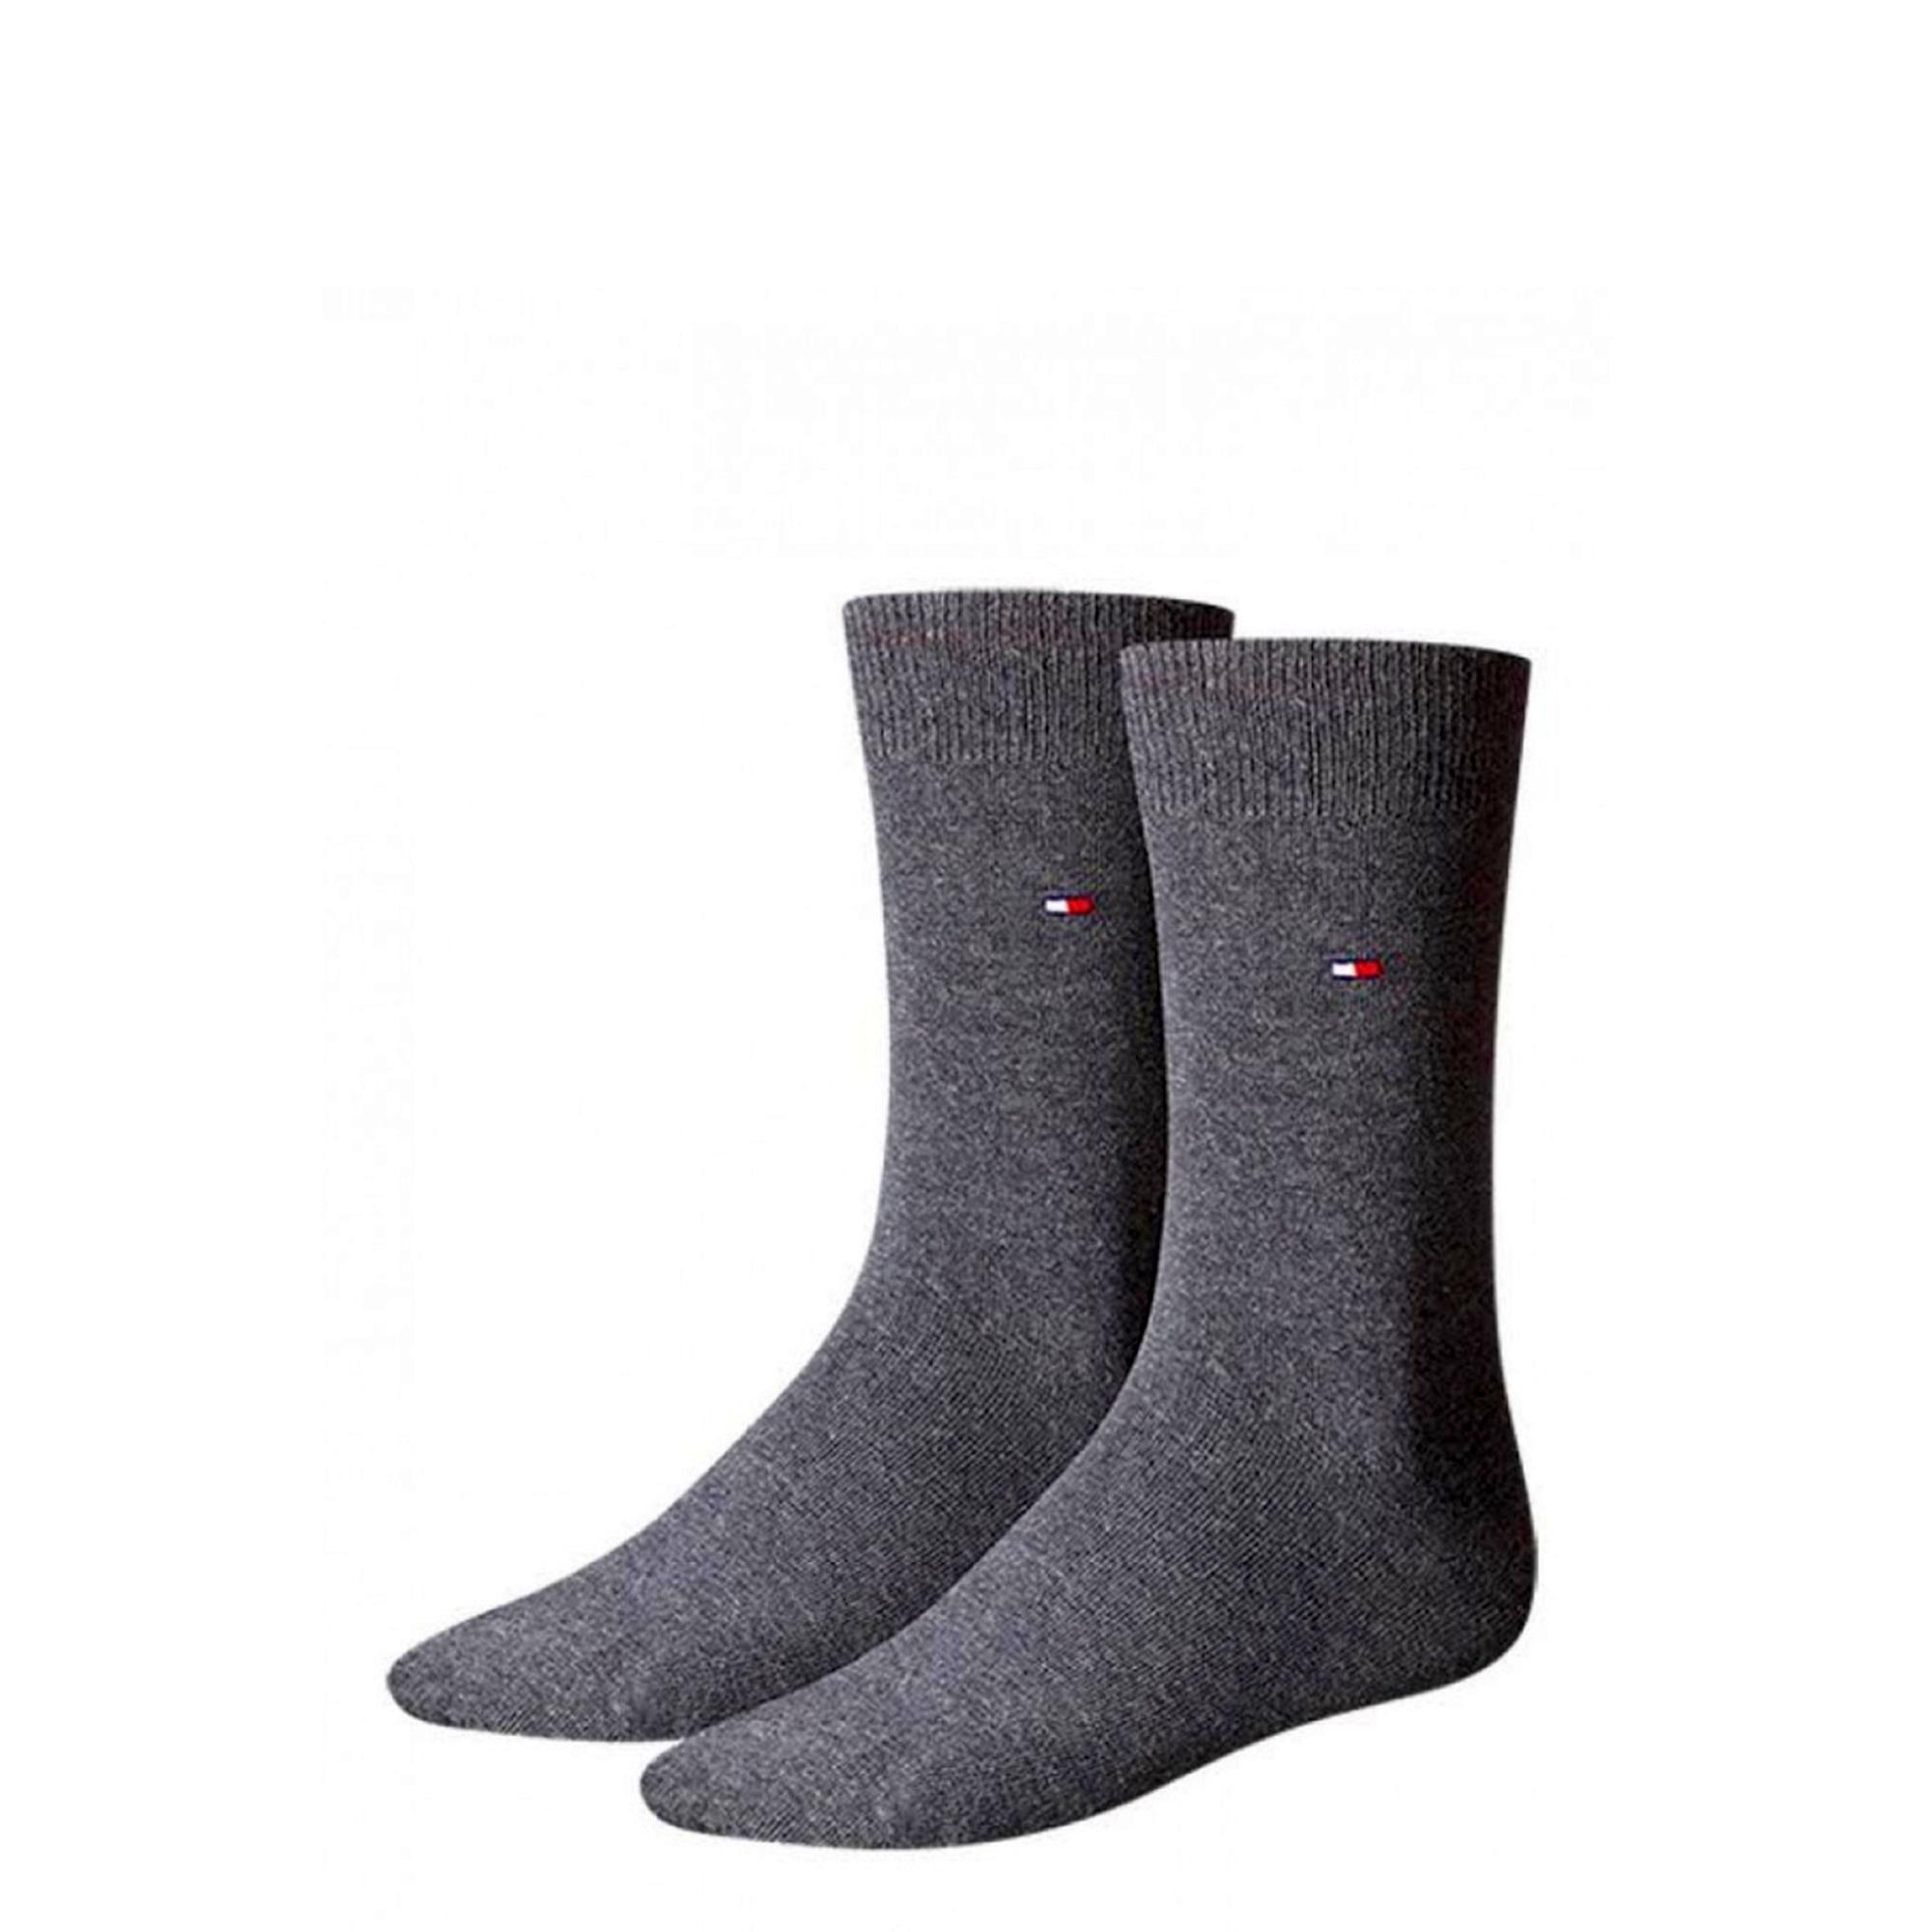 Tommy Hilfiger socks 371111 030 Antracite